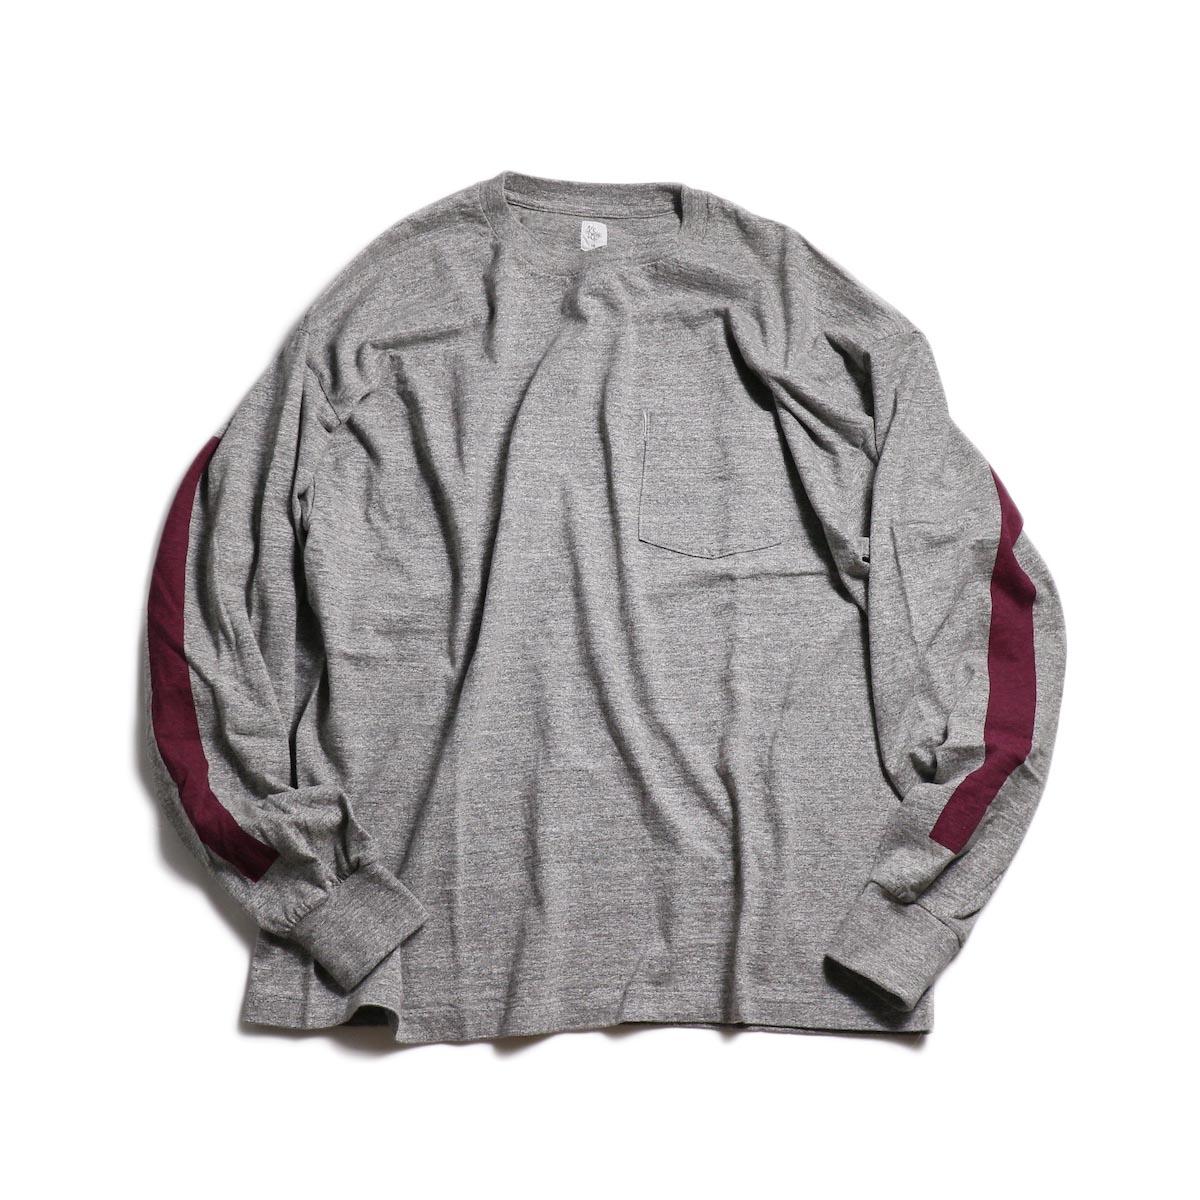 Kaptain Sunshine / West Coast L/S Tee -Feather Grey × Burgundy Line